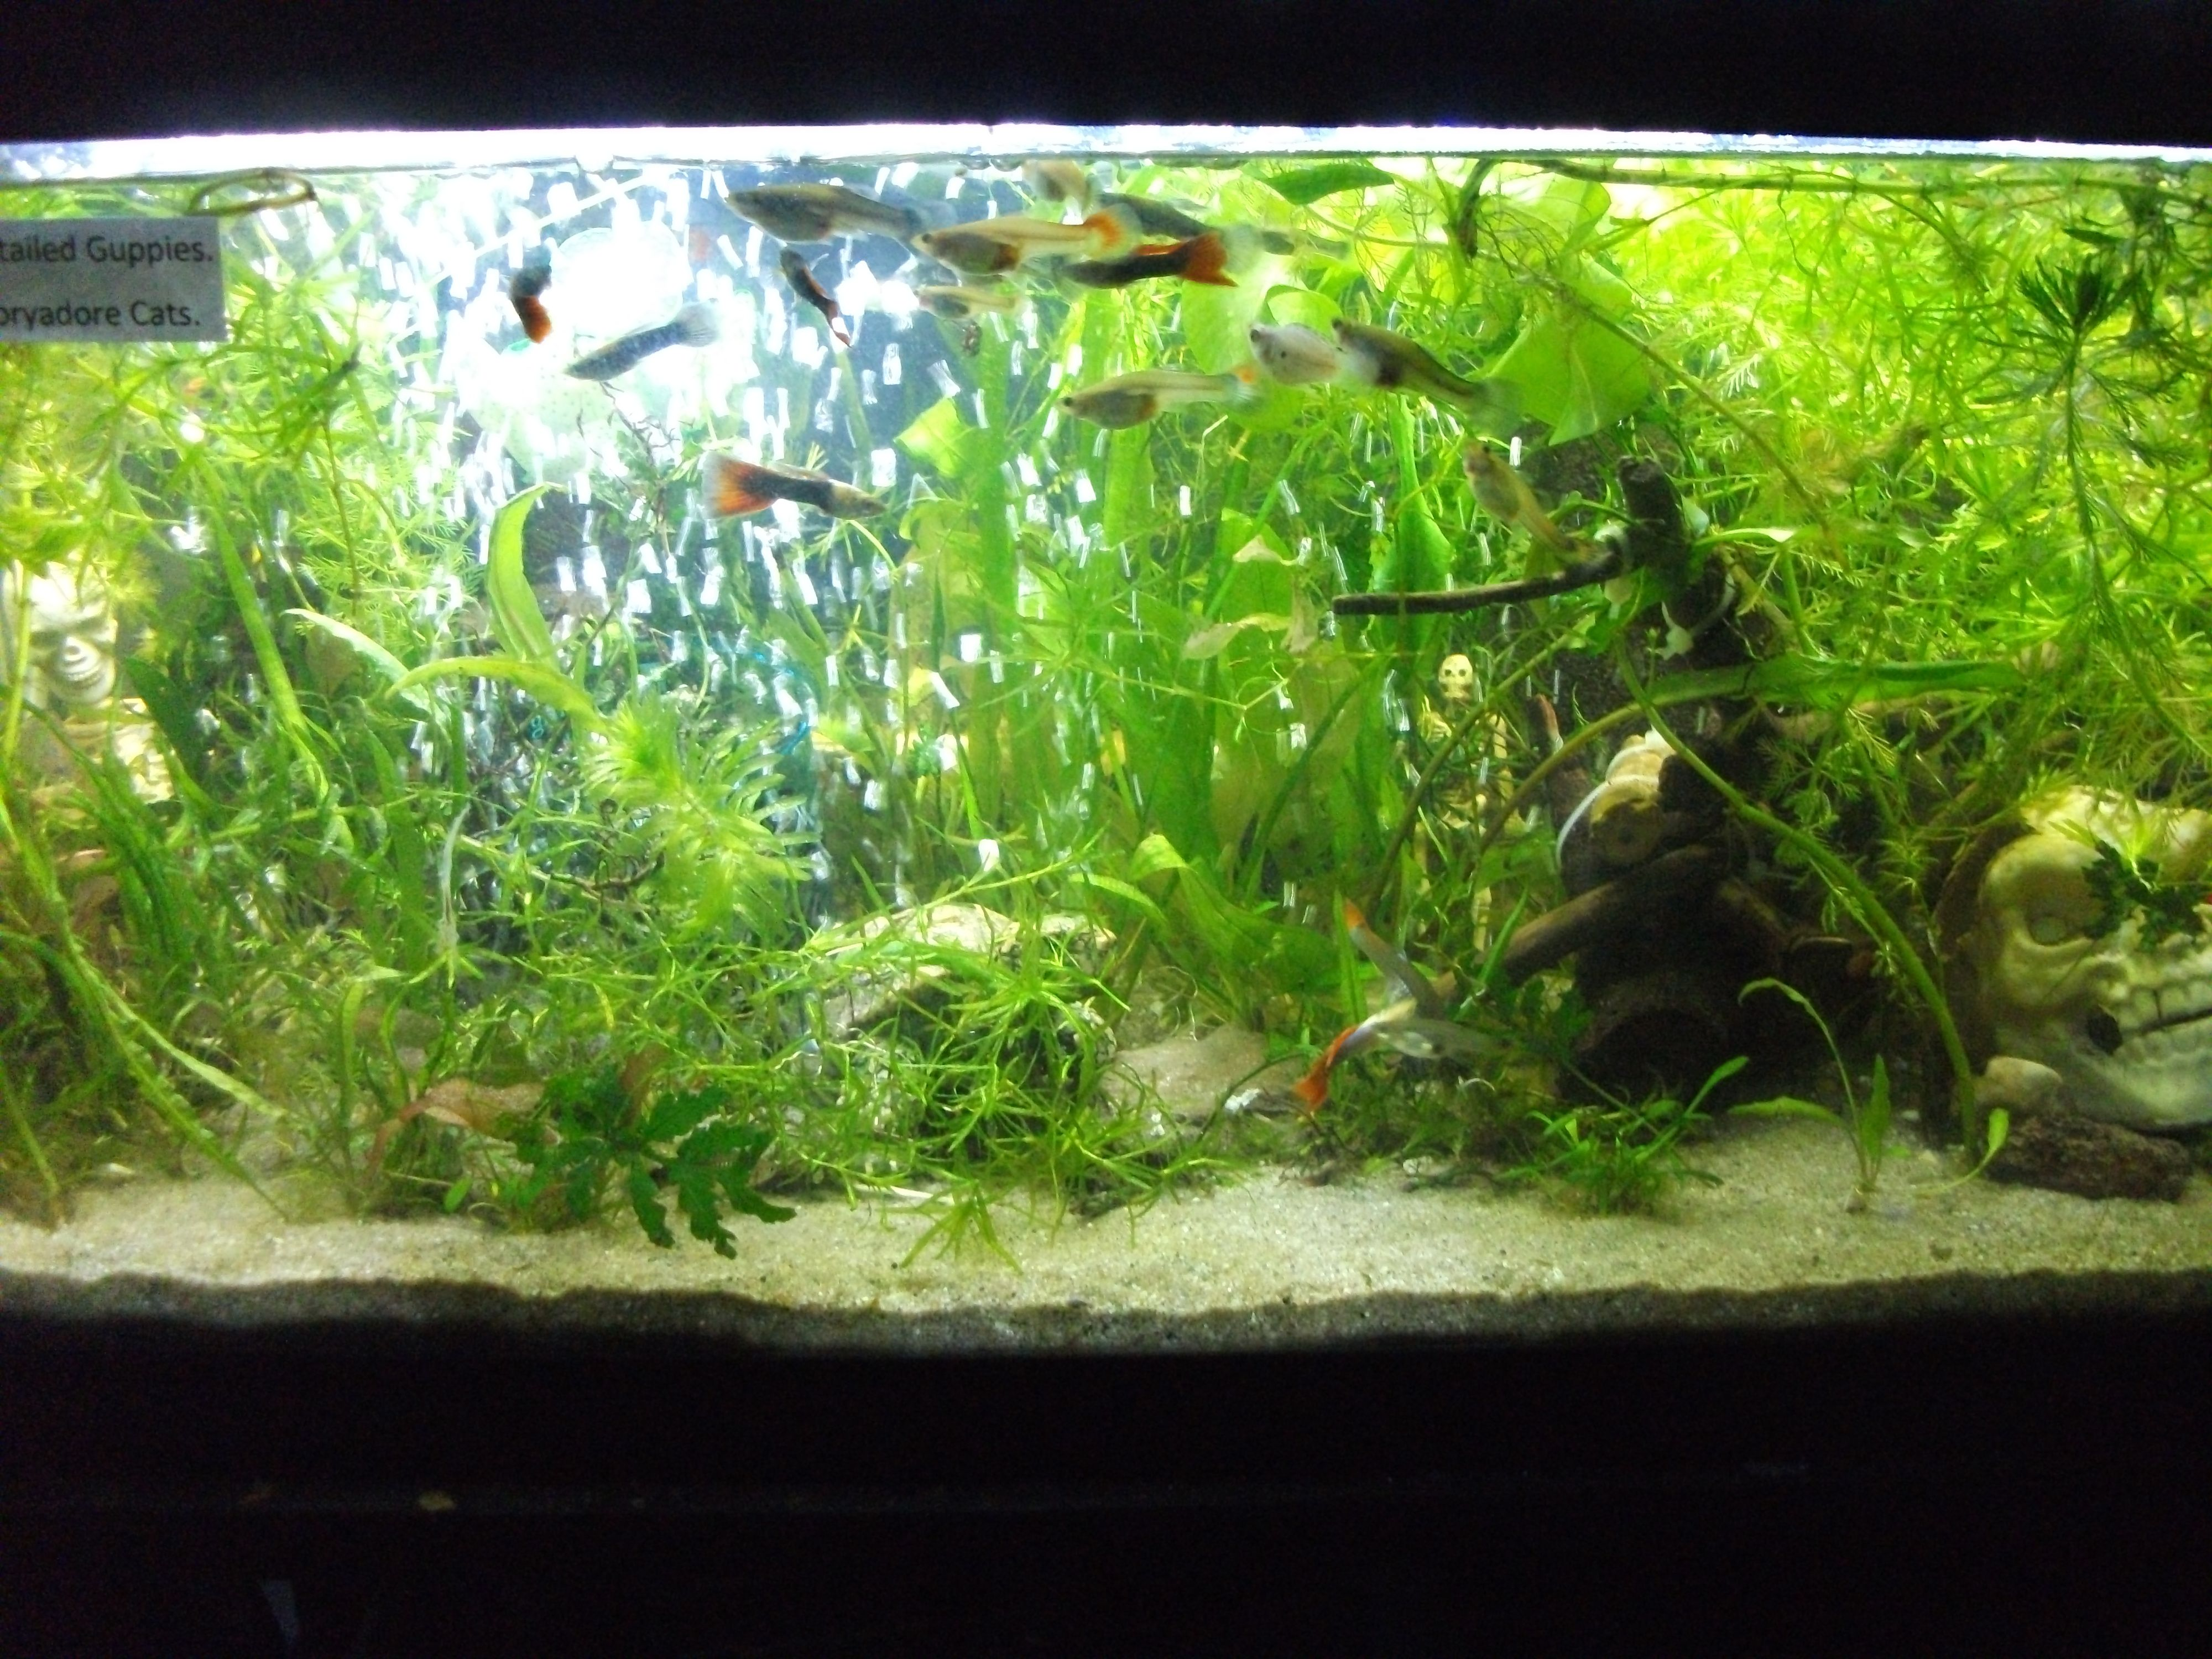 My 20 gallon long Guppy tank